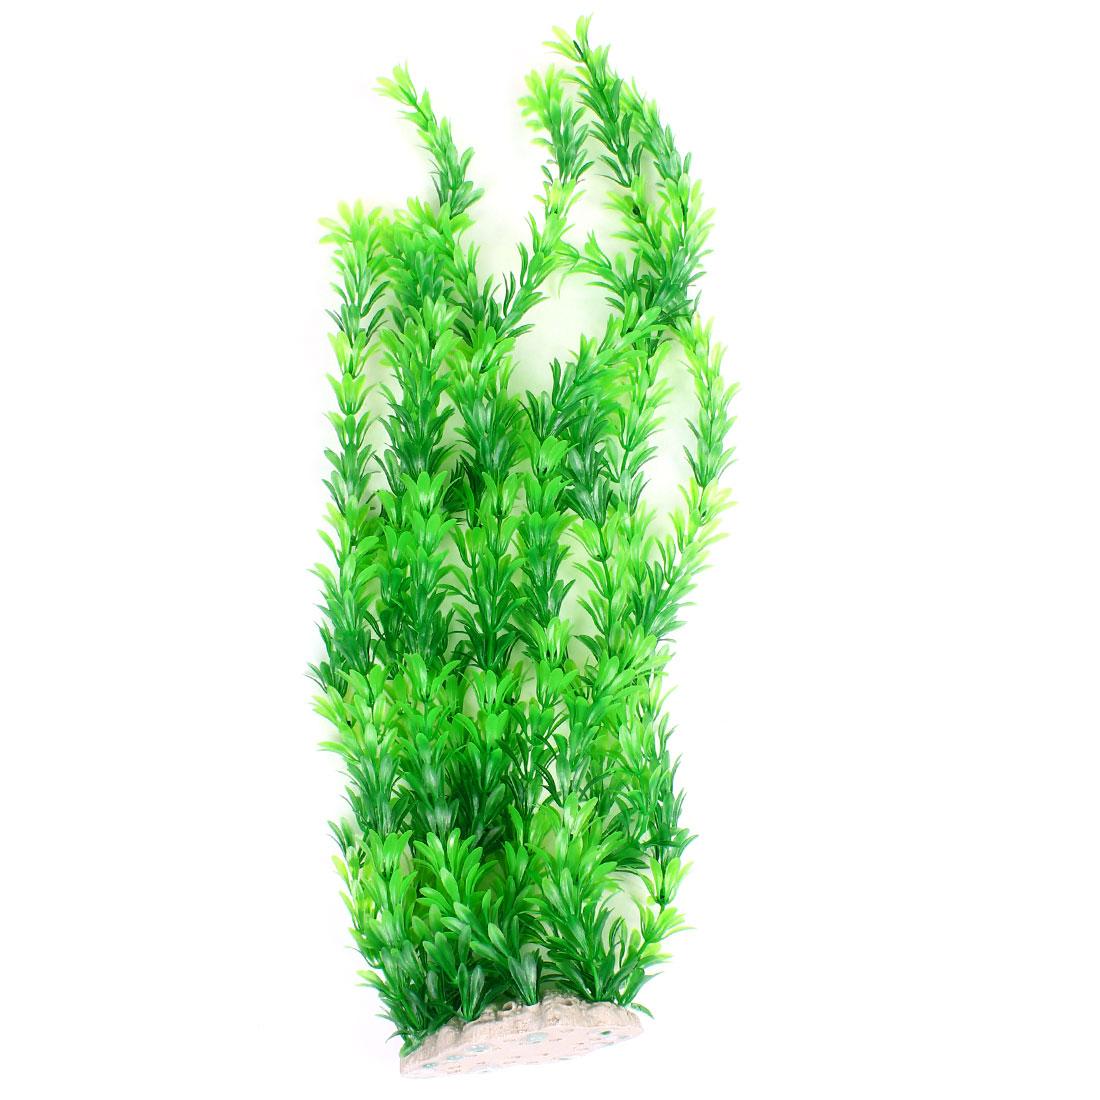 "Emulational Underwater Green Grass Plants 21.7"" Height for Aquarium"